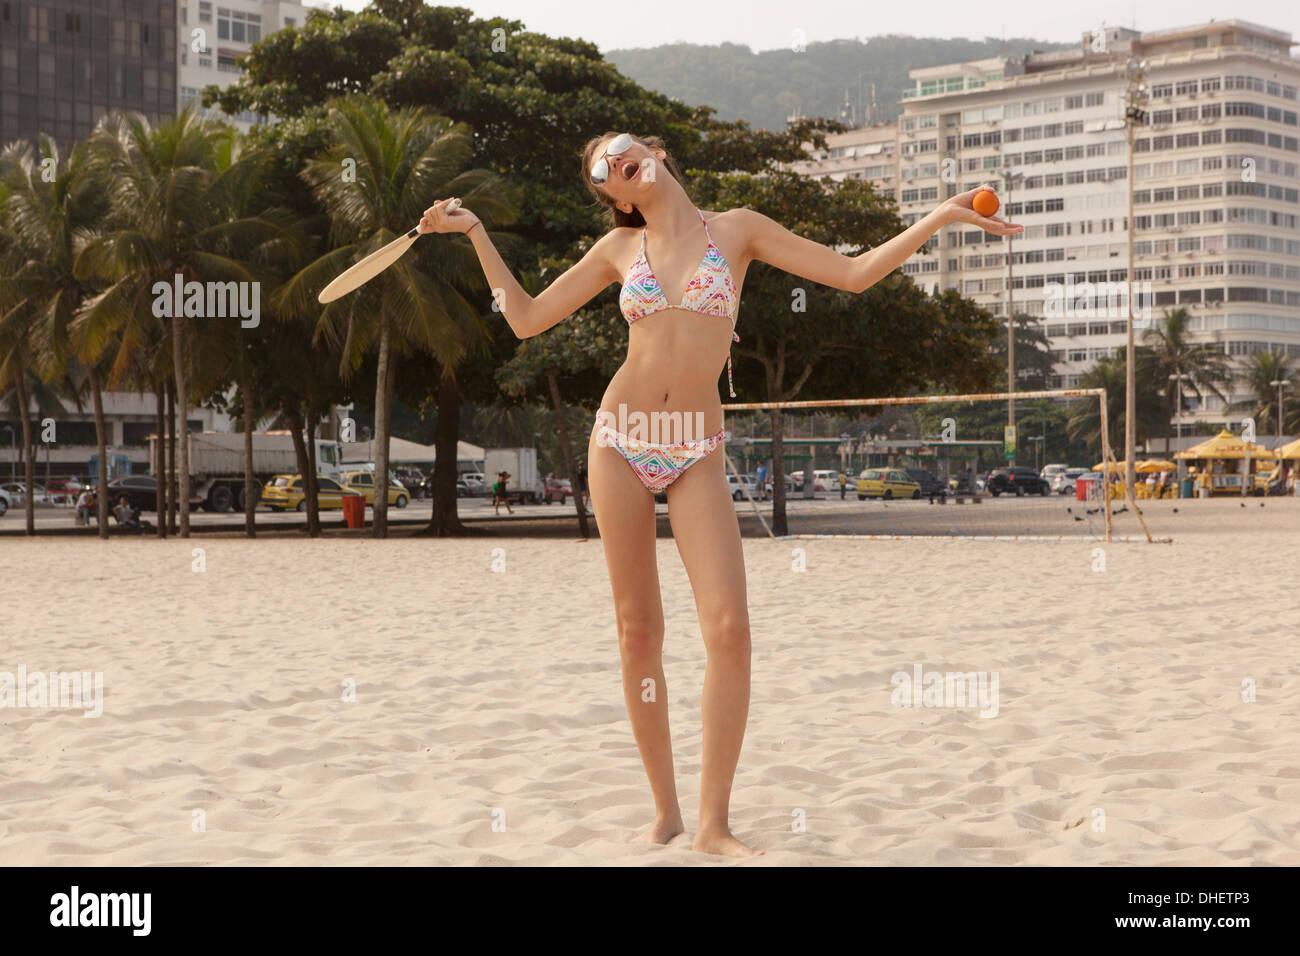 Frau mit lustigen Gesten am Copcacabana Strand, Rio De Janeiro, Brasilien Stockbild